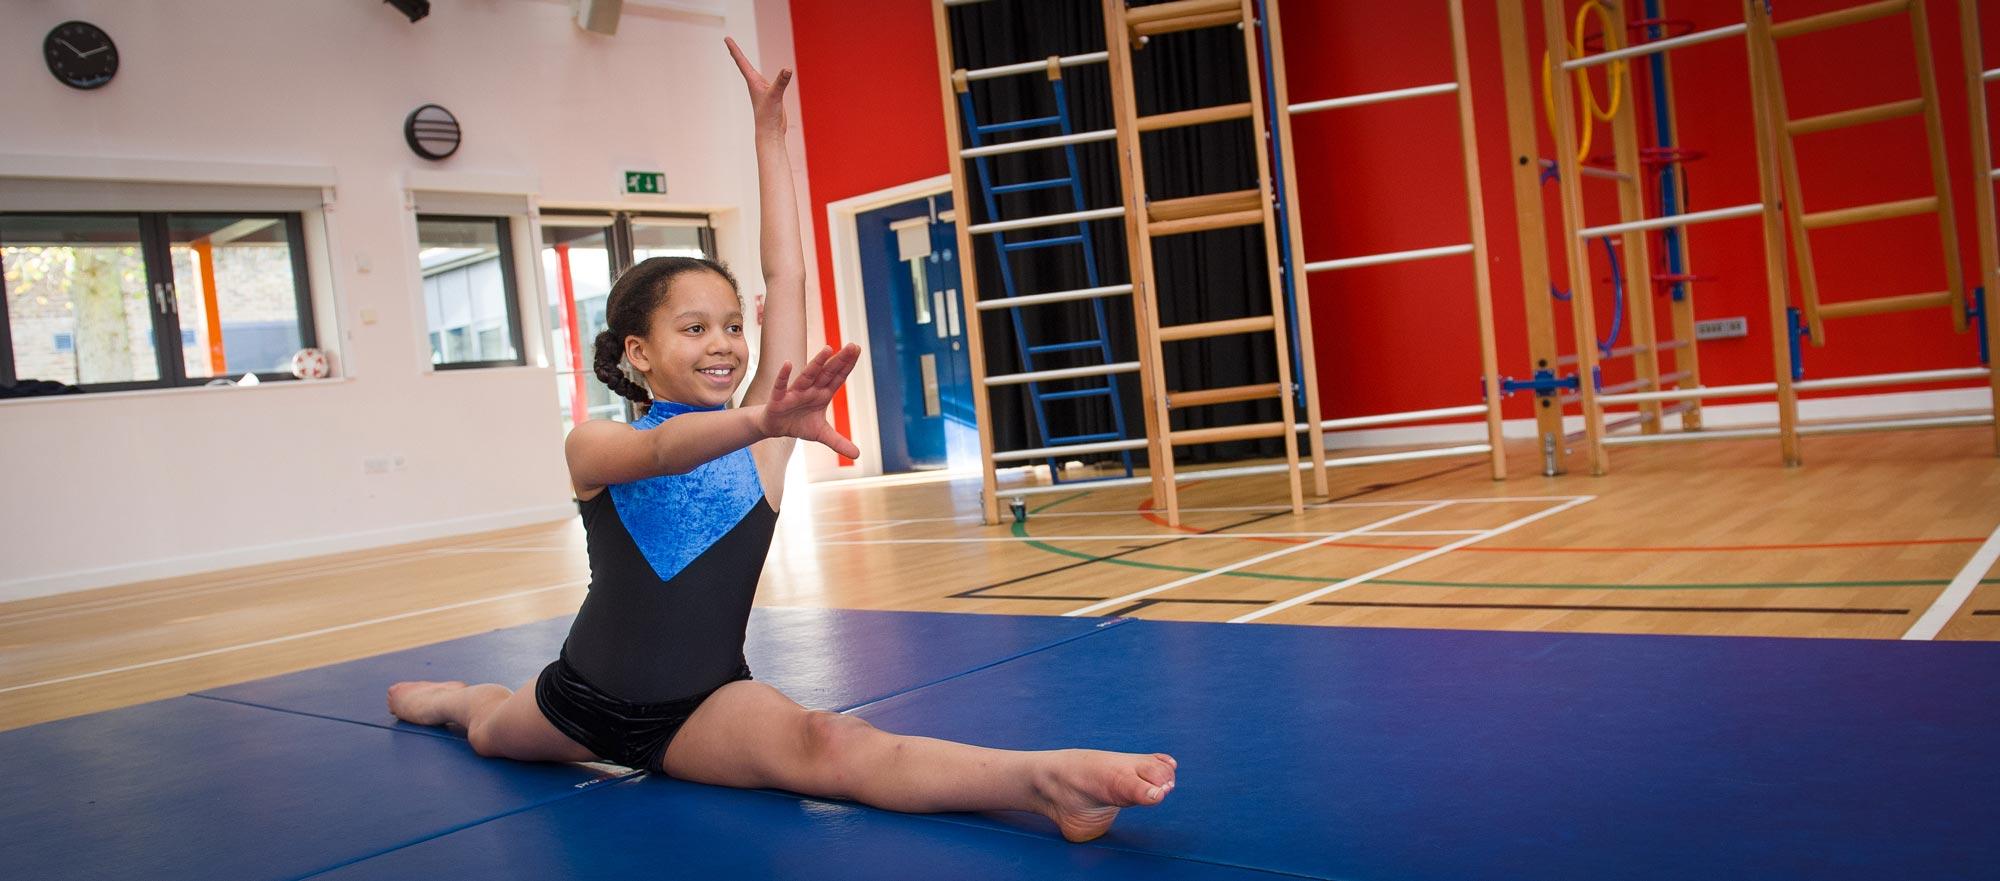 Girl doing a gymnastic split